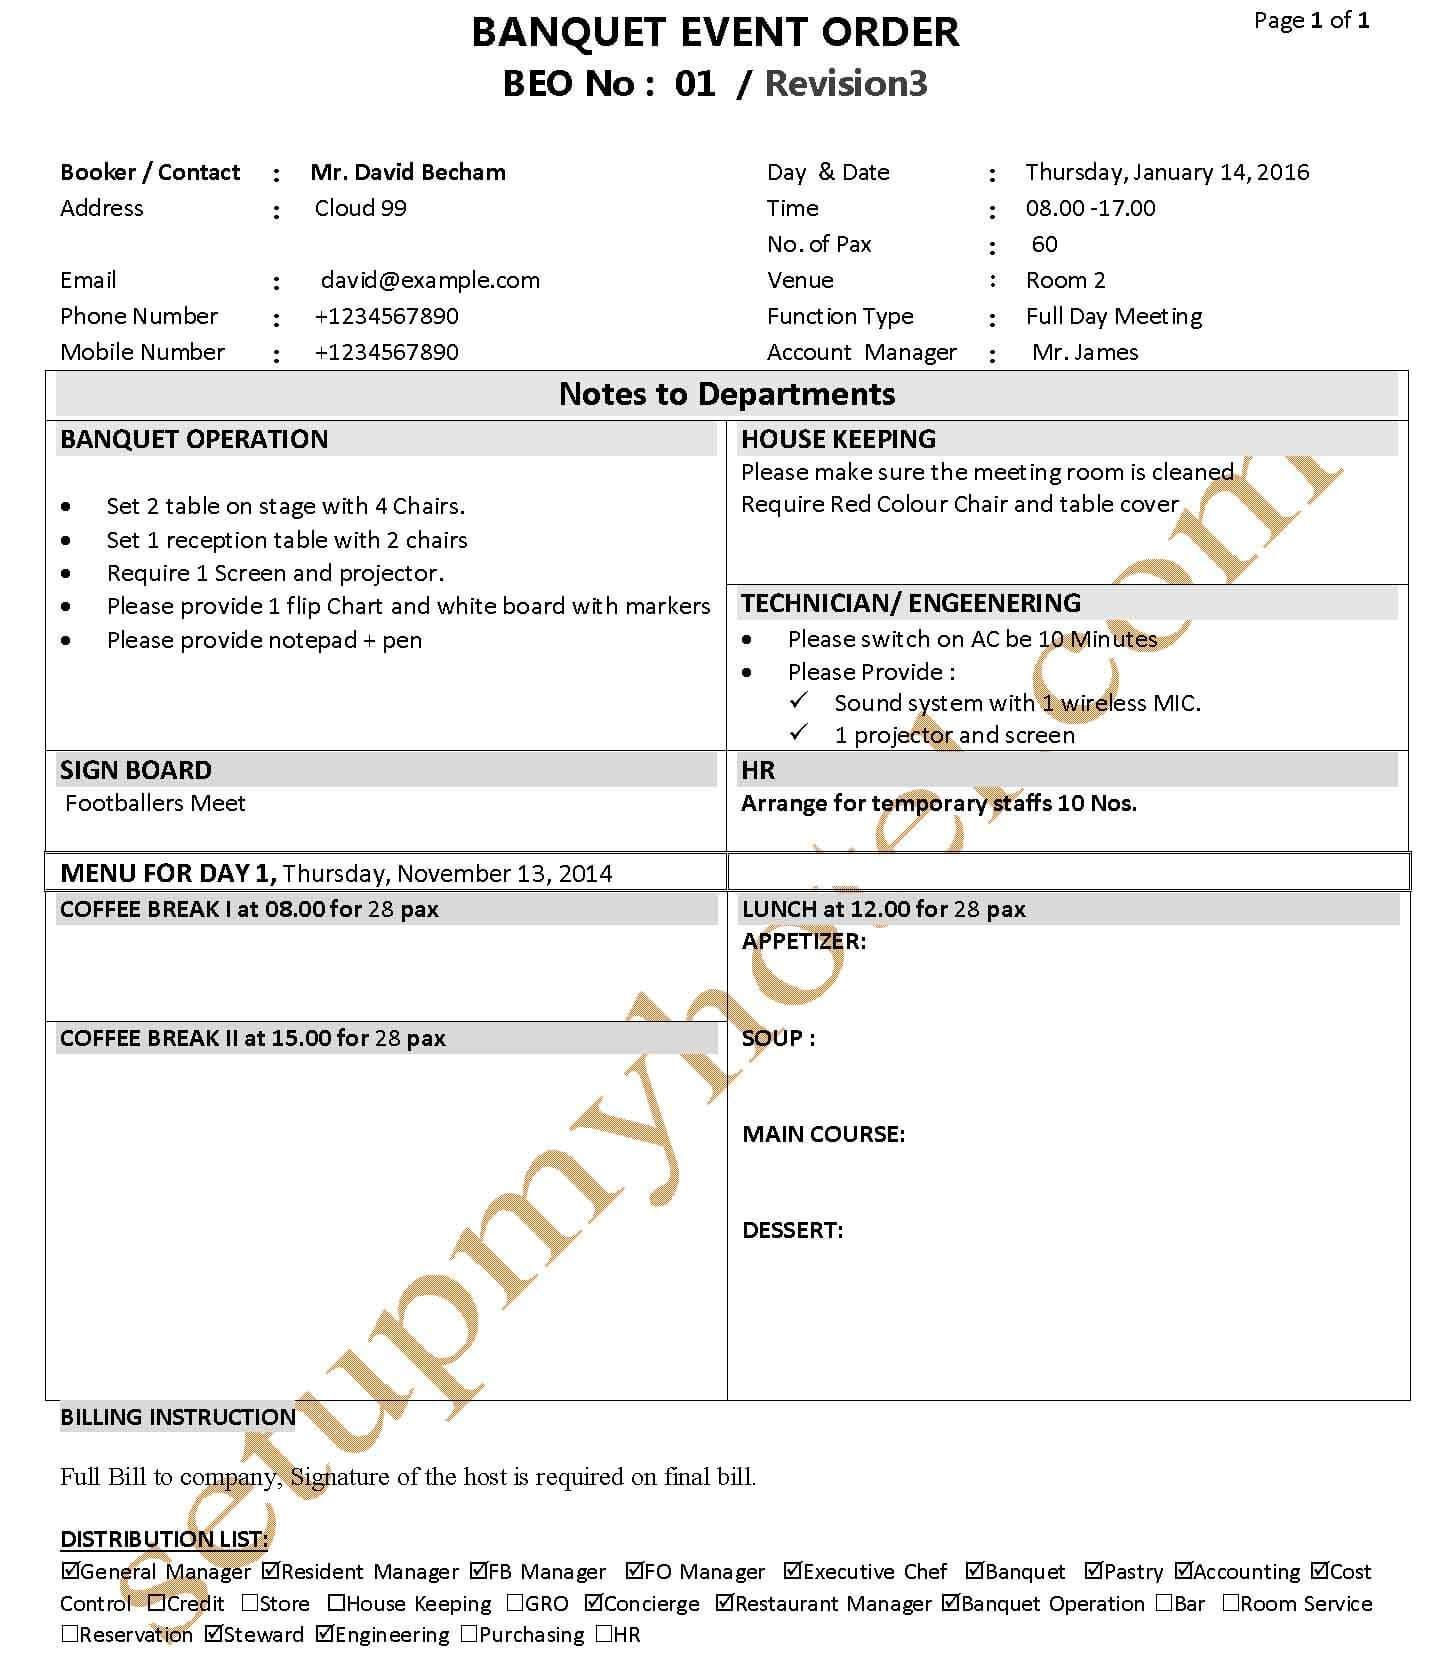 Banquet Function Plan Event Order Form Fp Beo Sample